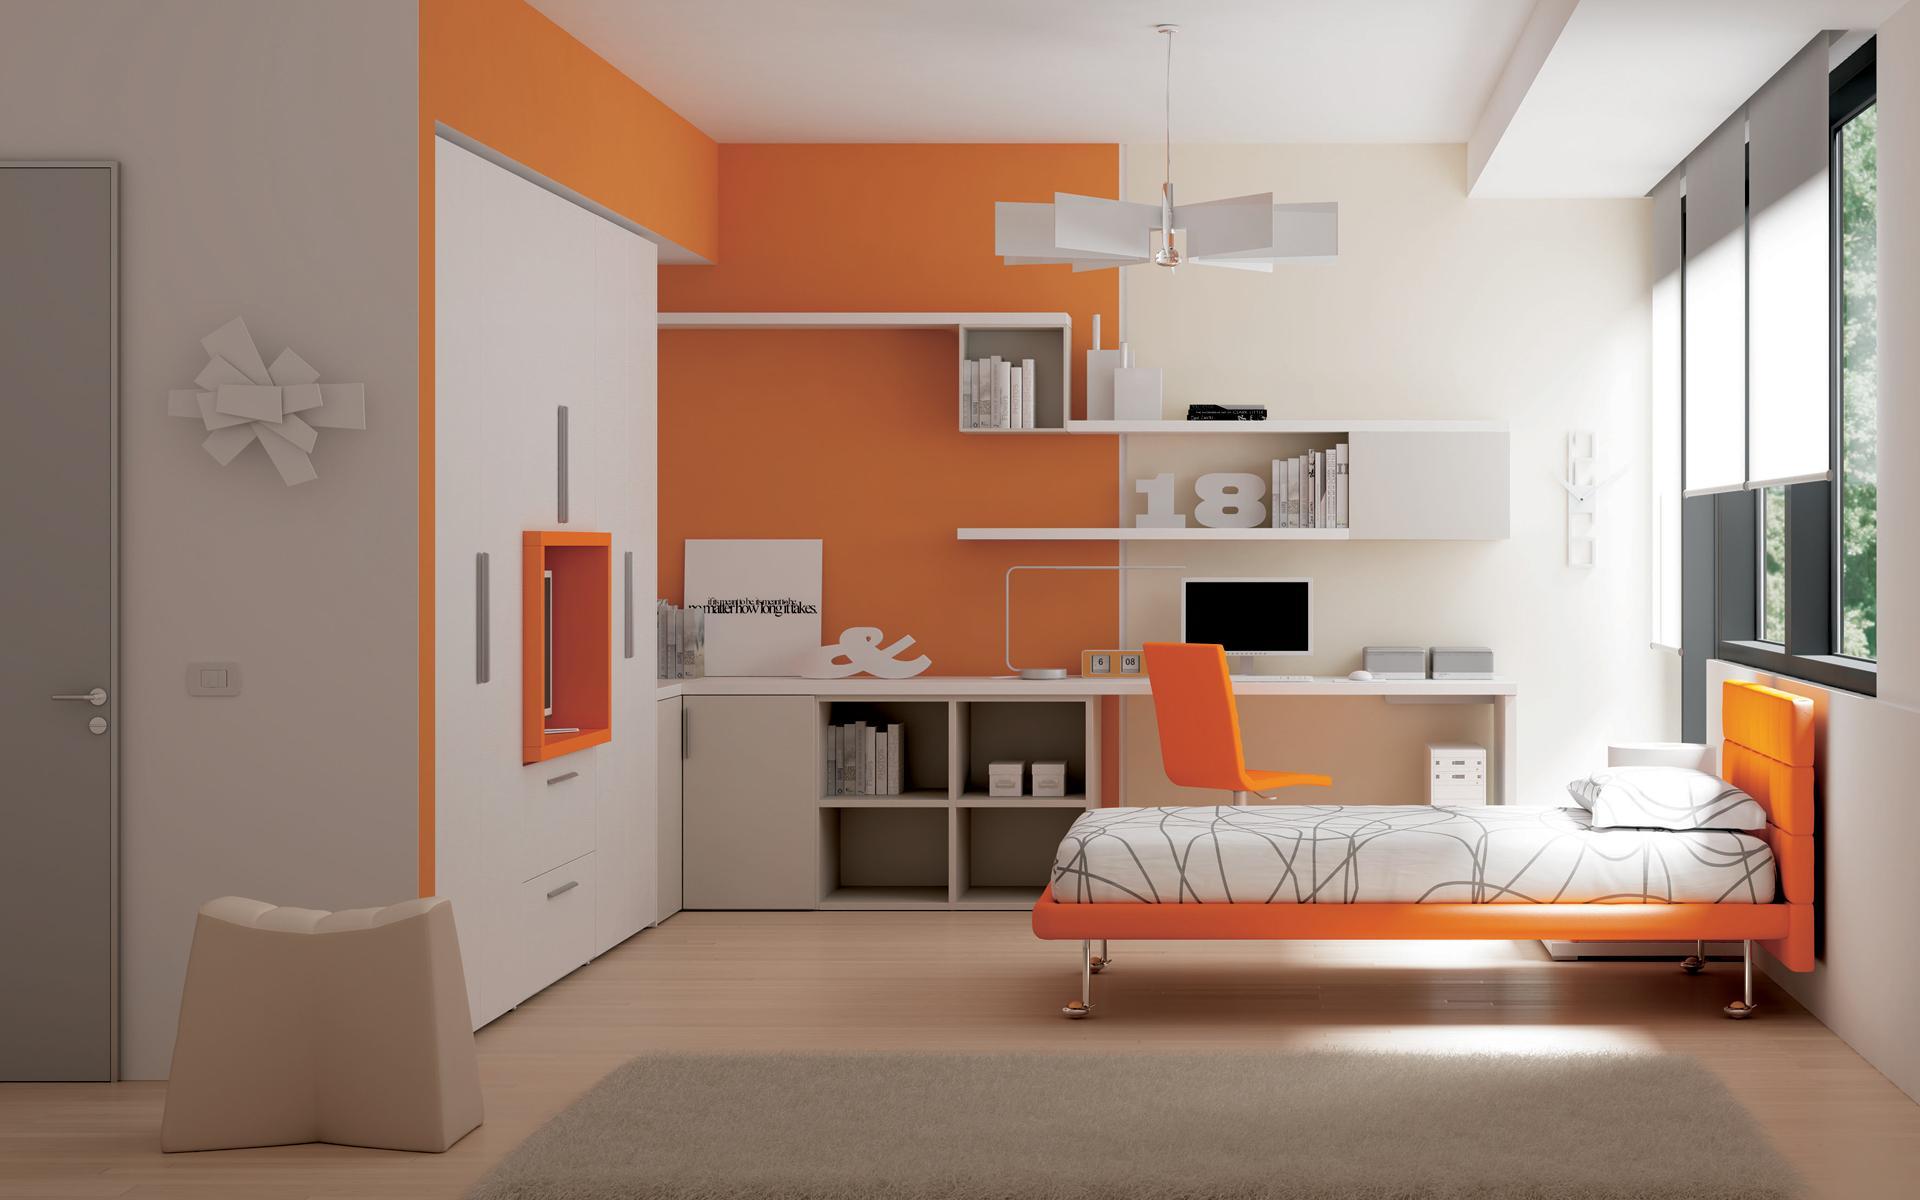 Camerette Ragazzi Moretti Prezzi cameretta: 4 proposte moderne e di design di pianeta casa